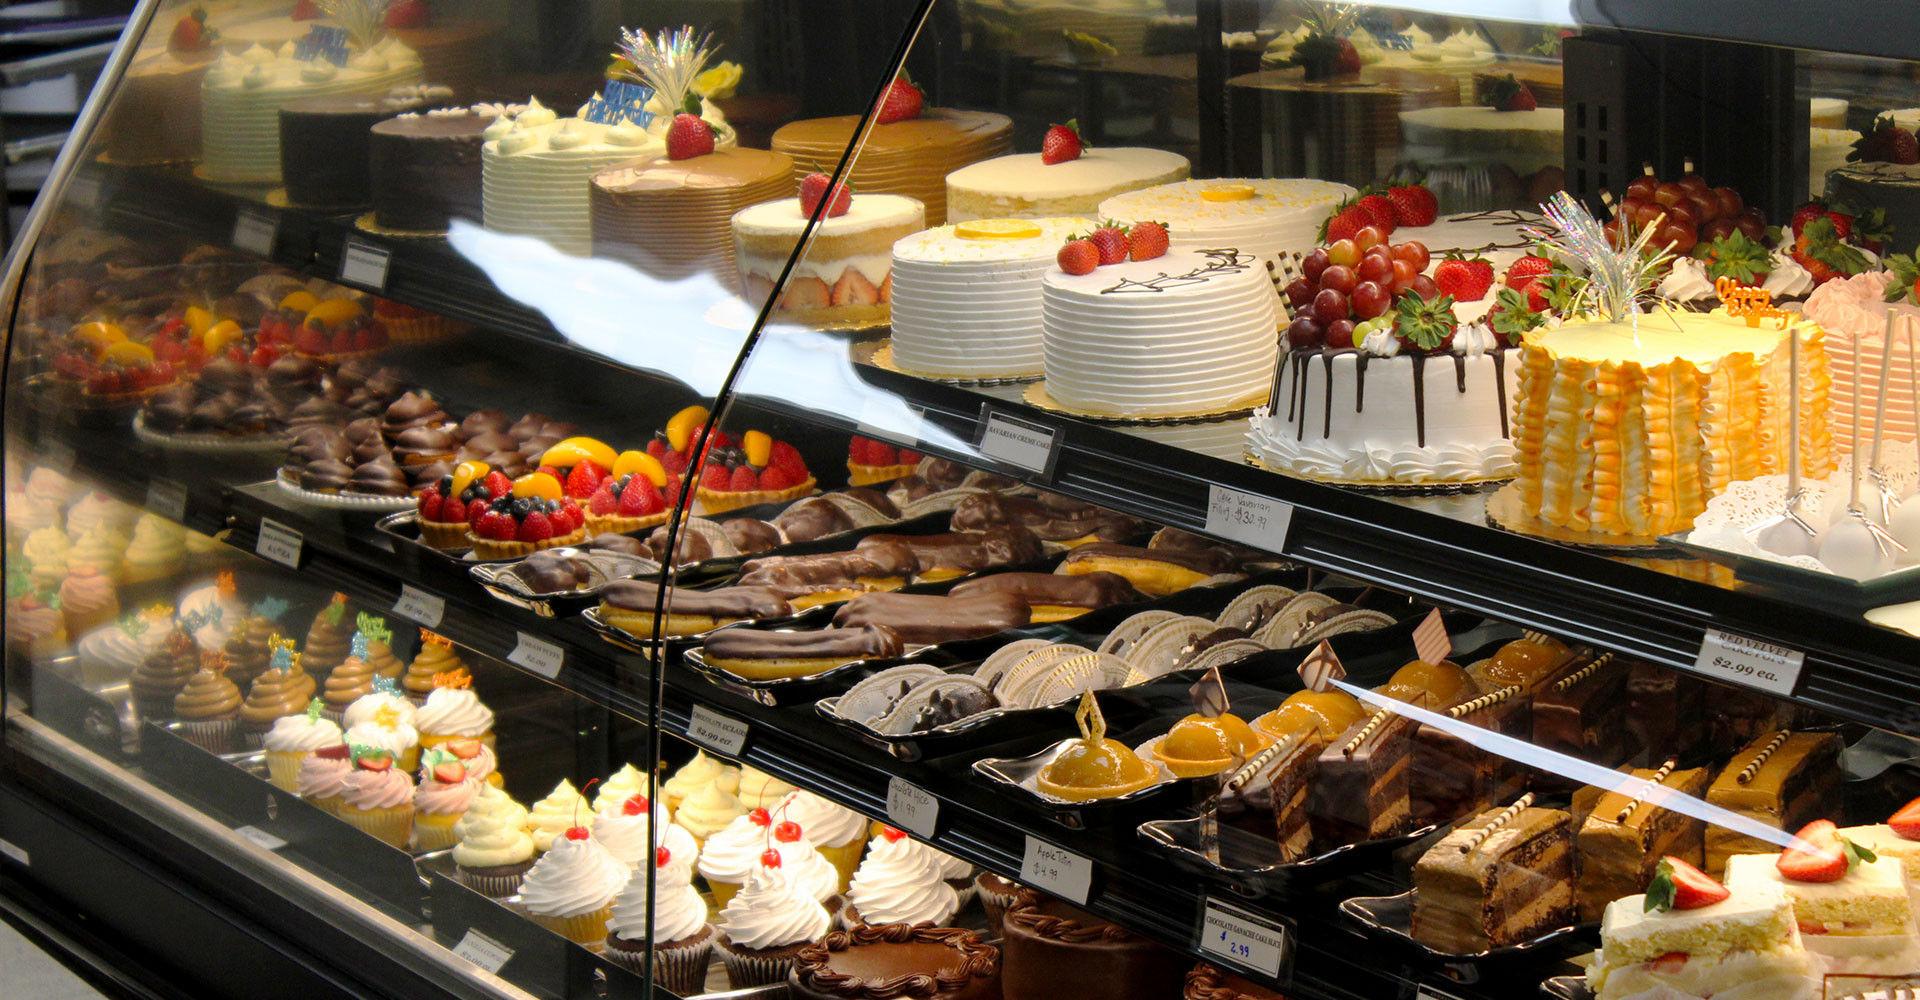 The Market at Poundridge - Bakery